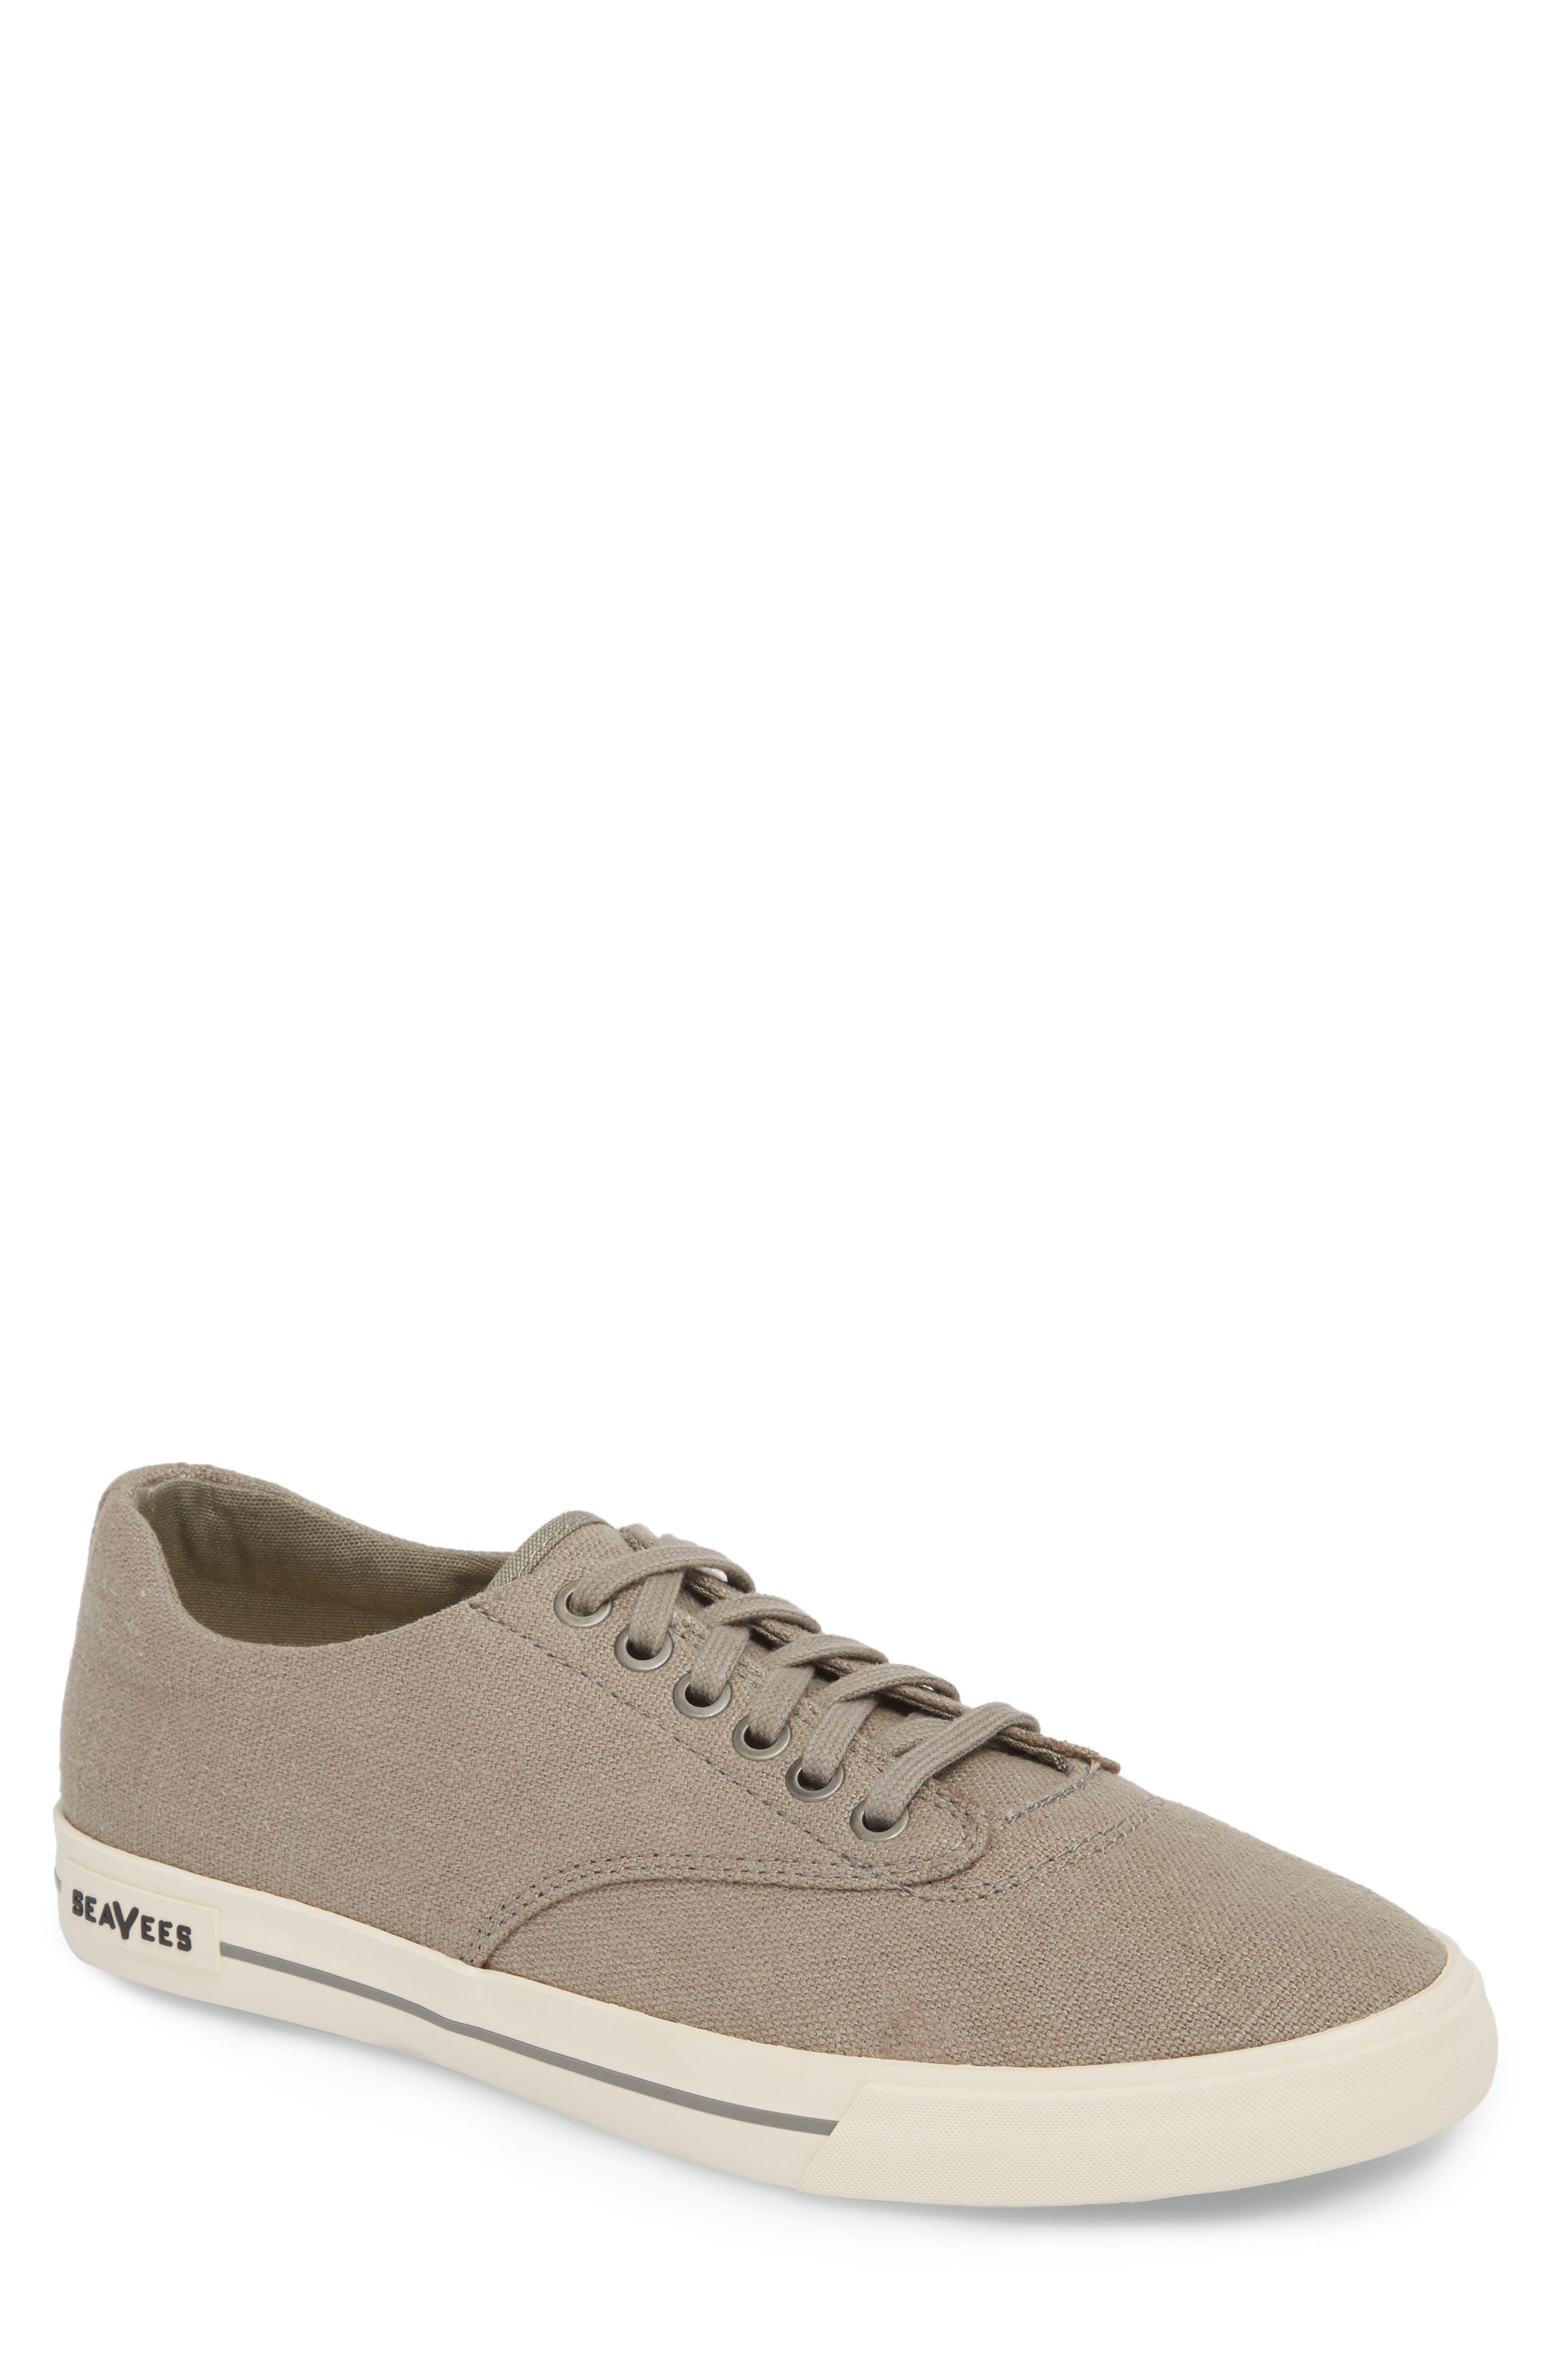 'Hermosa Plimsoll' Sneaker,                             Main thumbnail 1, color,                             TIN GREY VINTAGE WASH LINEN